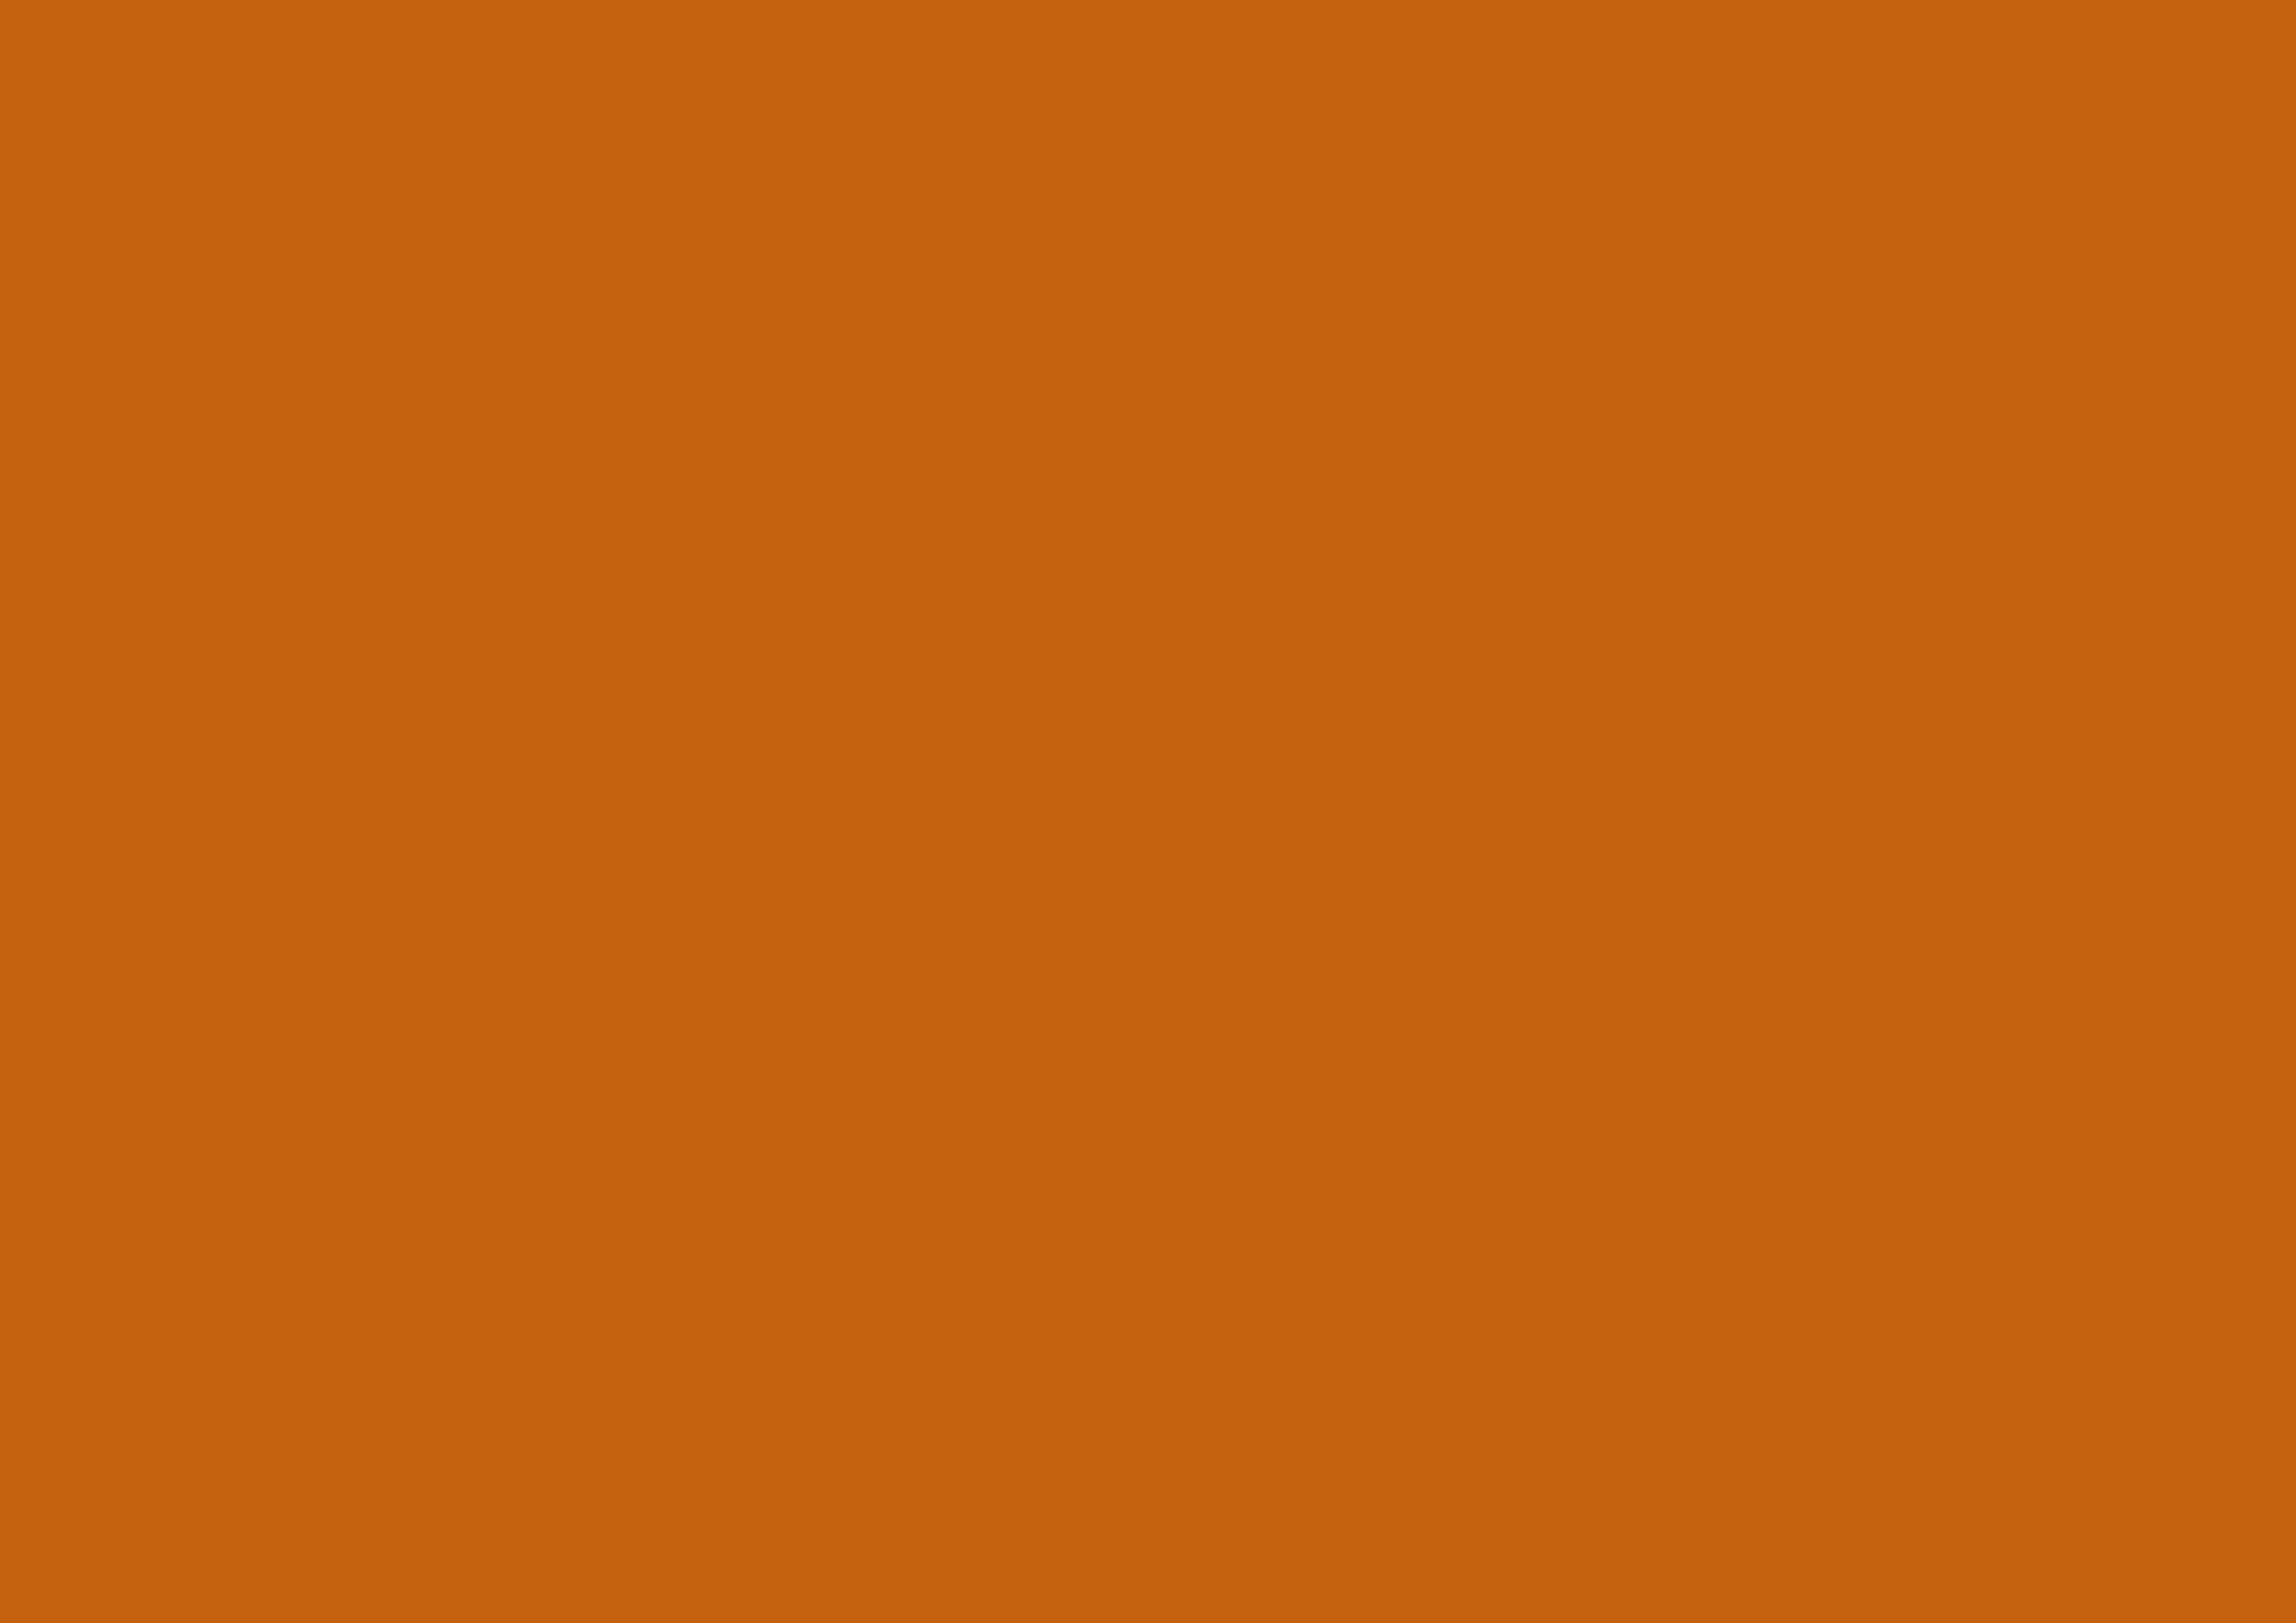 3508x2480 Alloy Orange Solid Color Background